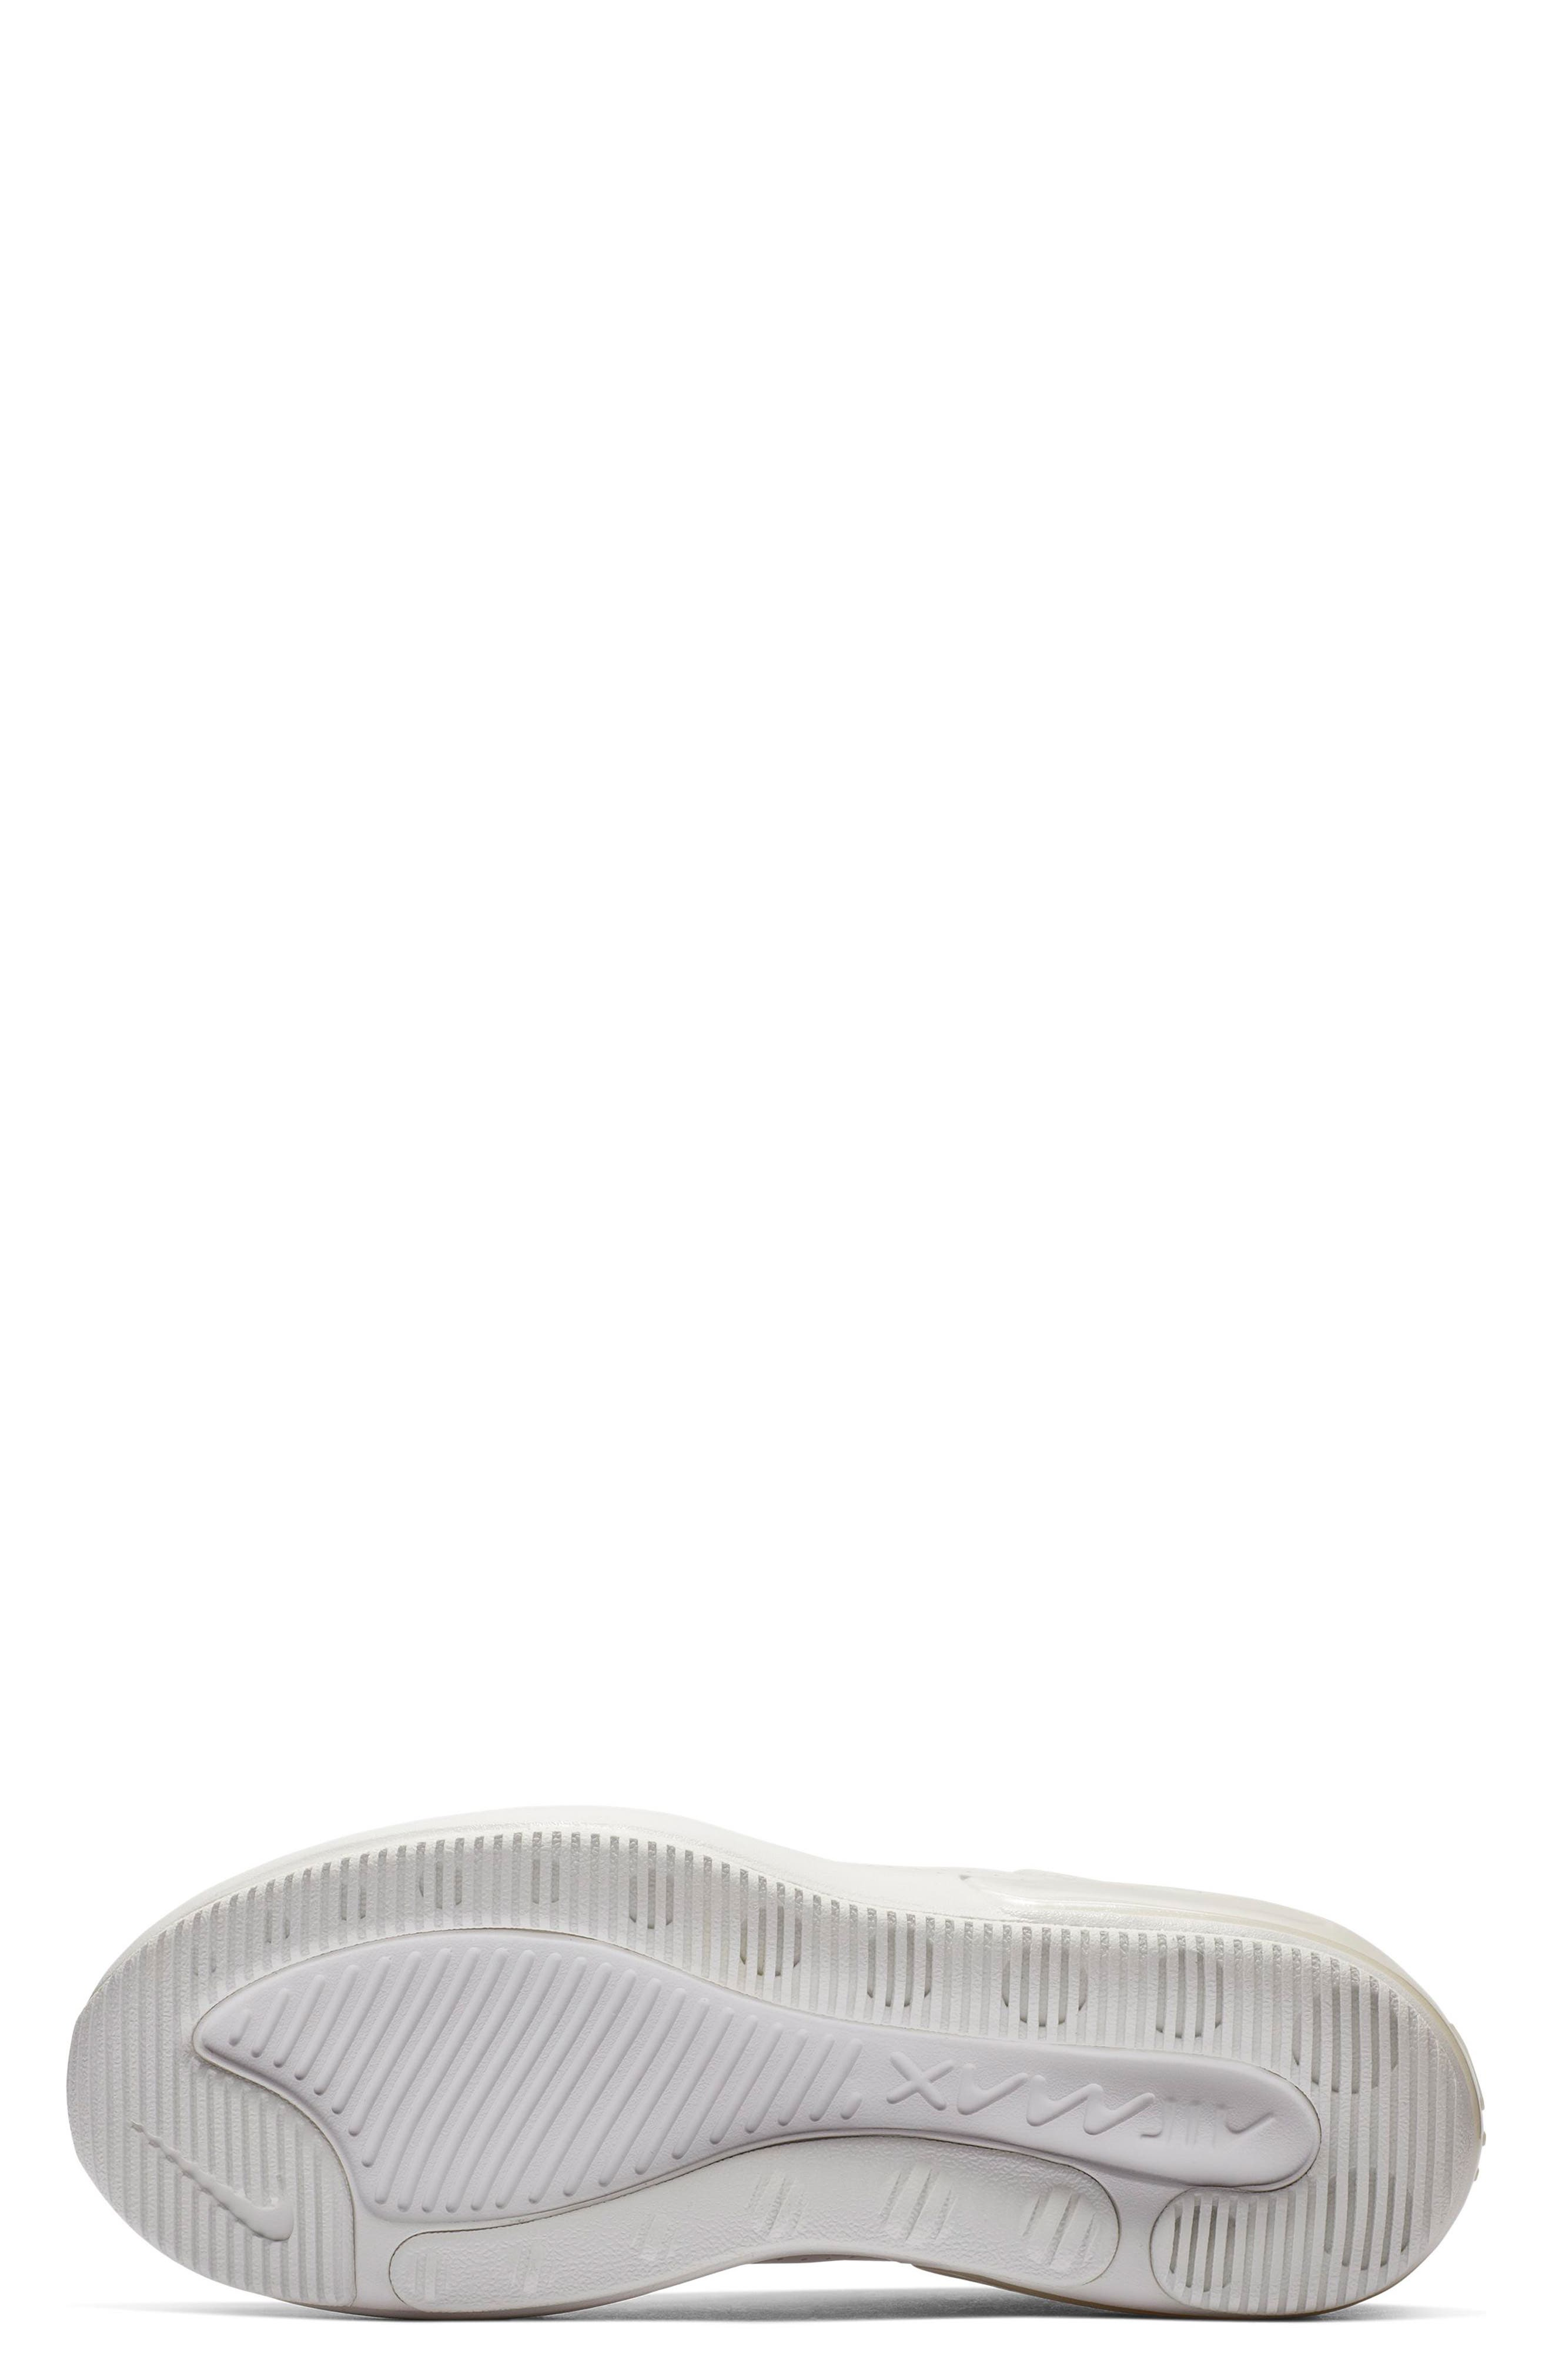 Air Max DIA SE Running Shoe,                             Alternate thumbnail 4, color,                             WHITE/ ALUMINUM/ WHITE